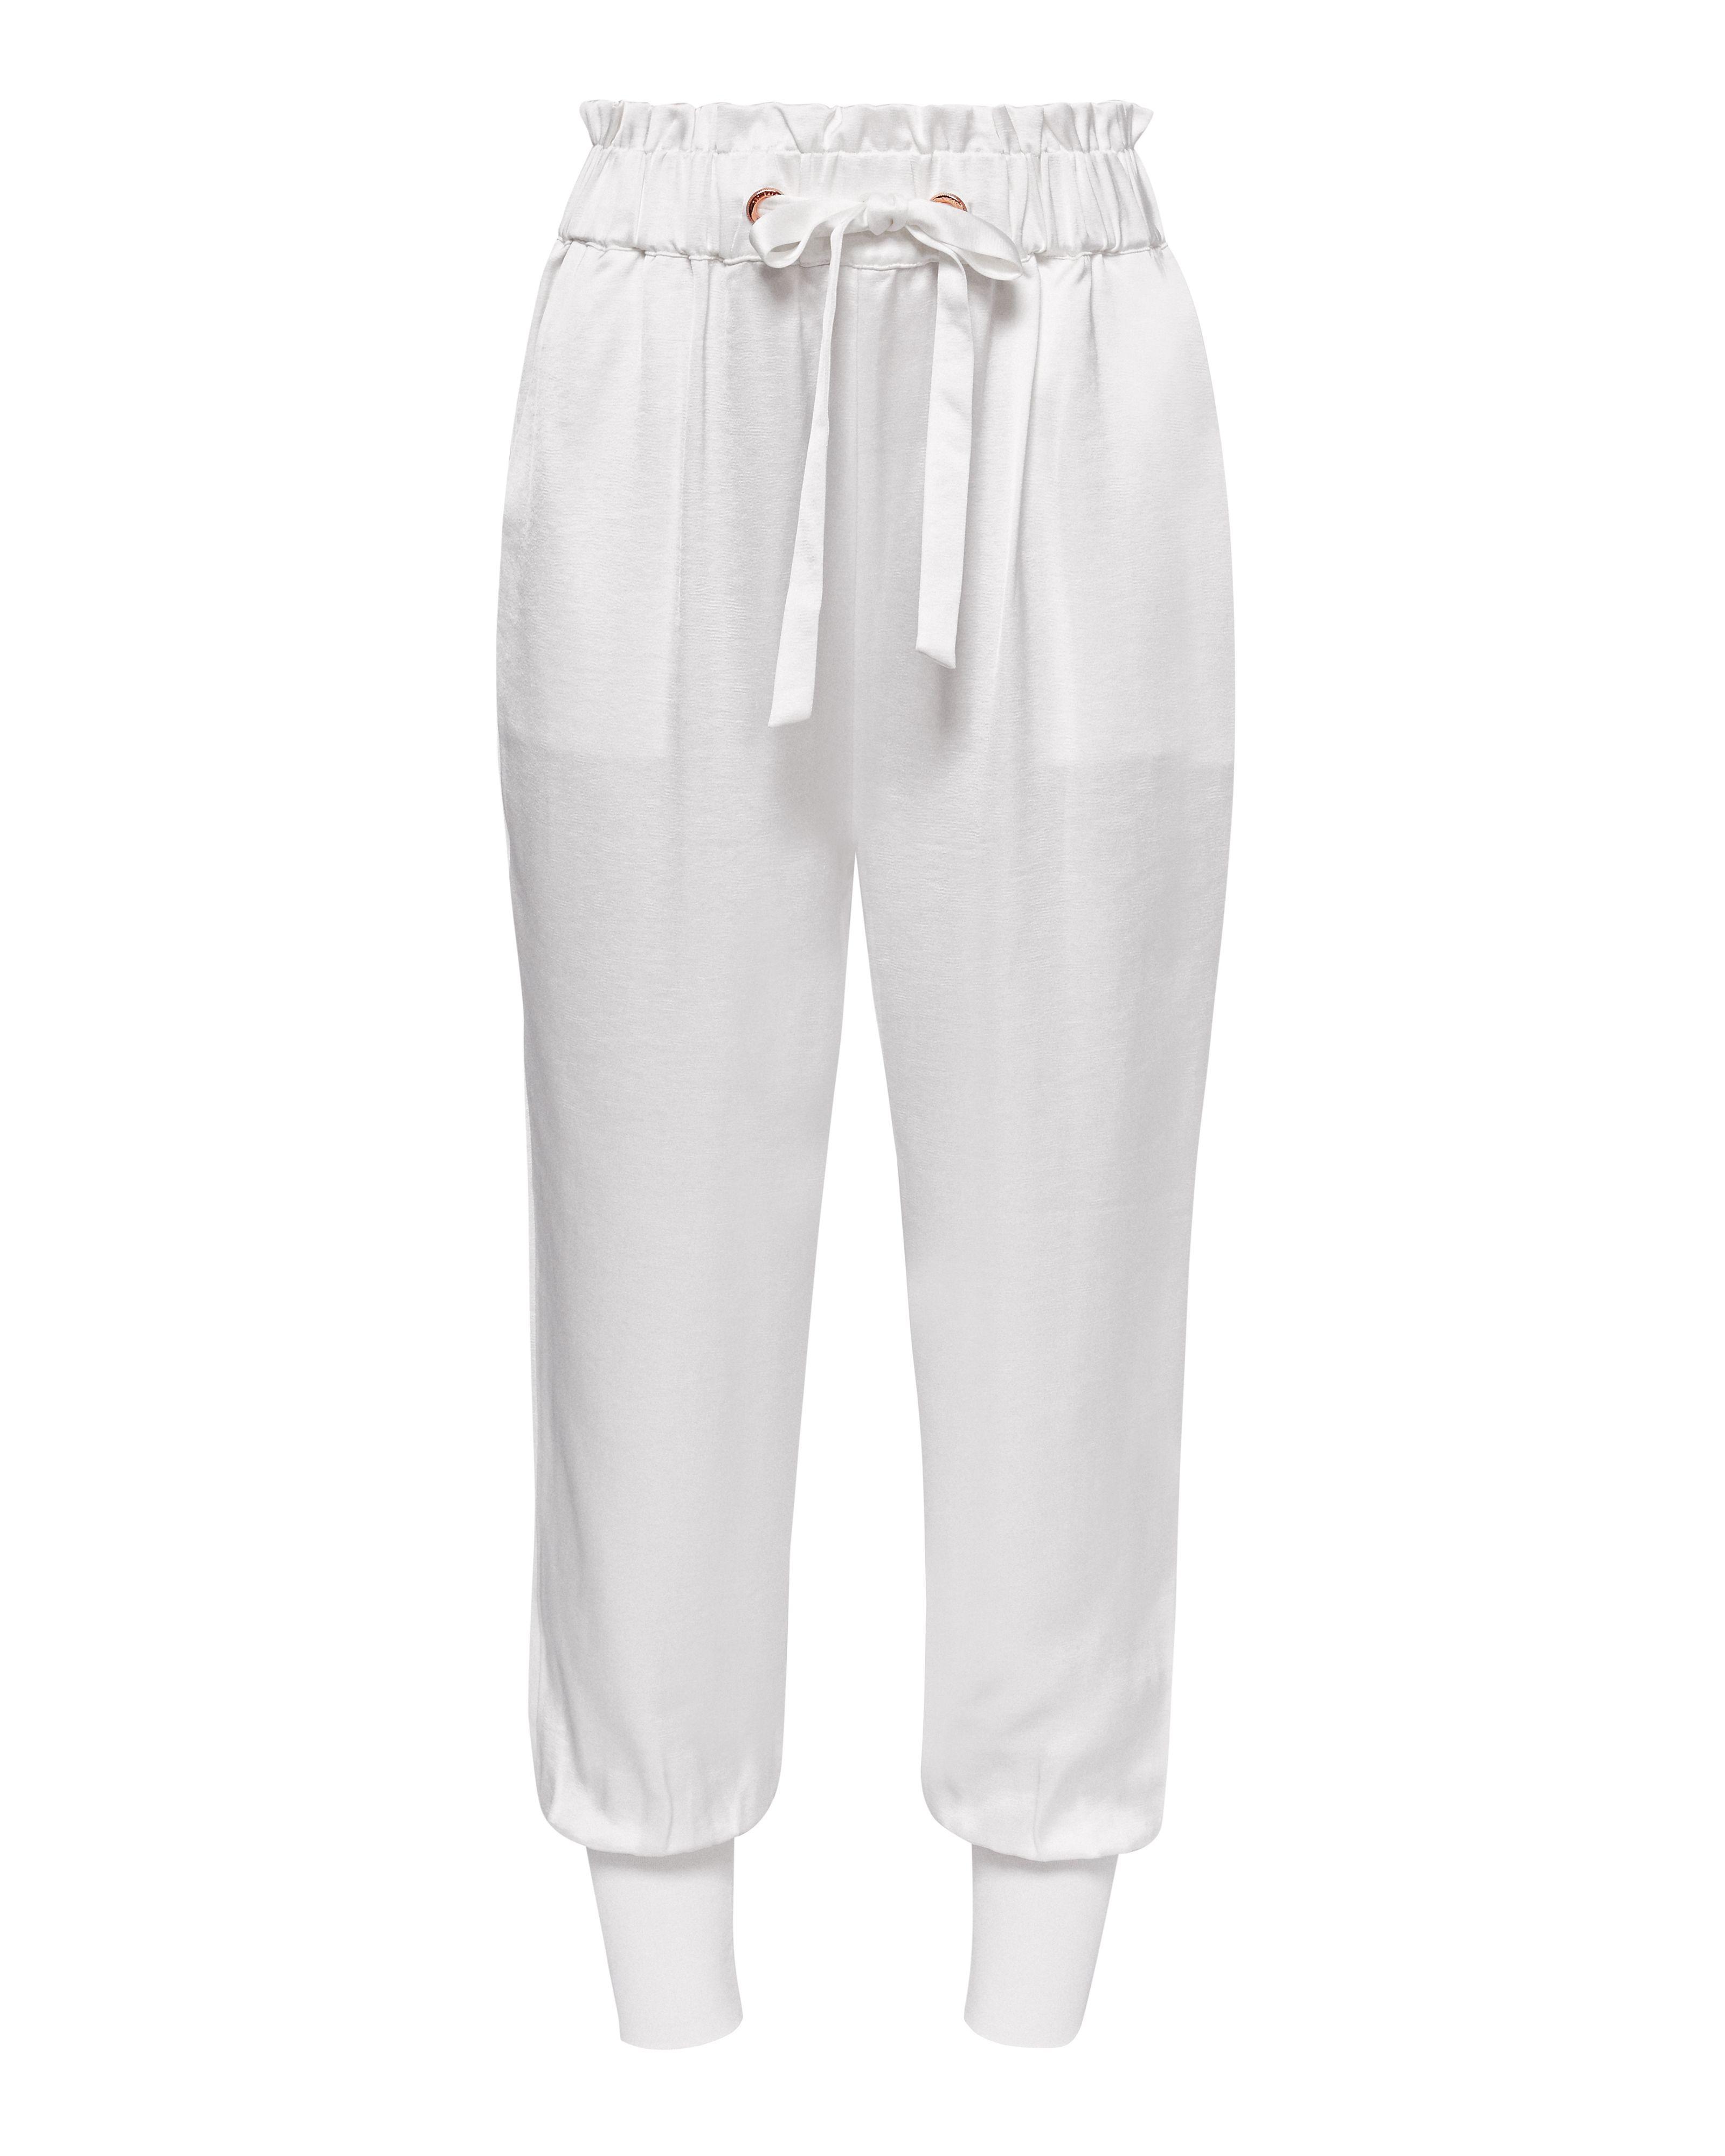 Paper Bag High Waist Trousers Ted Baker Perfect Sale Cheap Sale Geniue Stockist USwTquBb